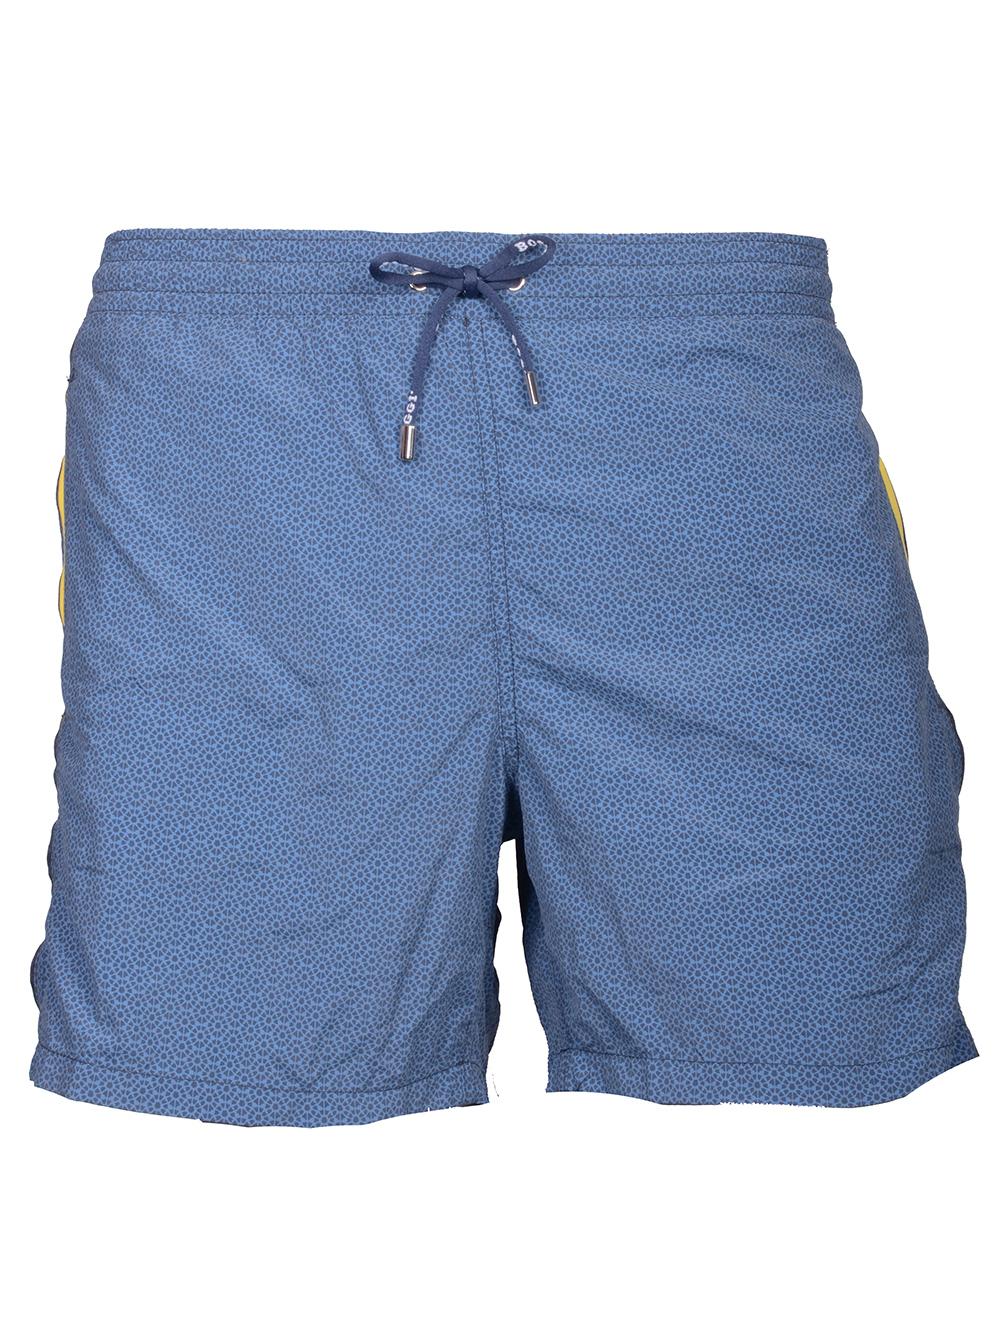 BOGGI Μαγιό shorts B018P093001 ΡΟΥΑ